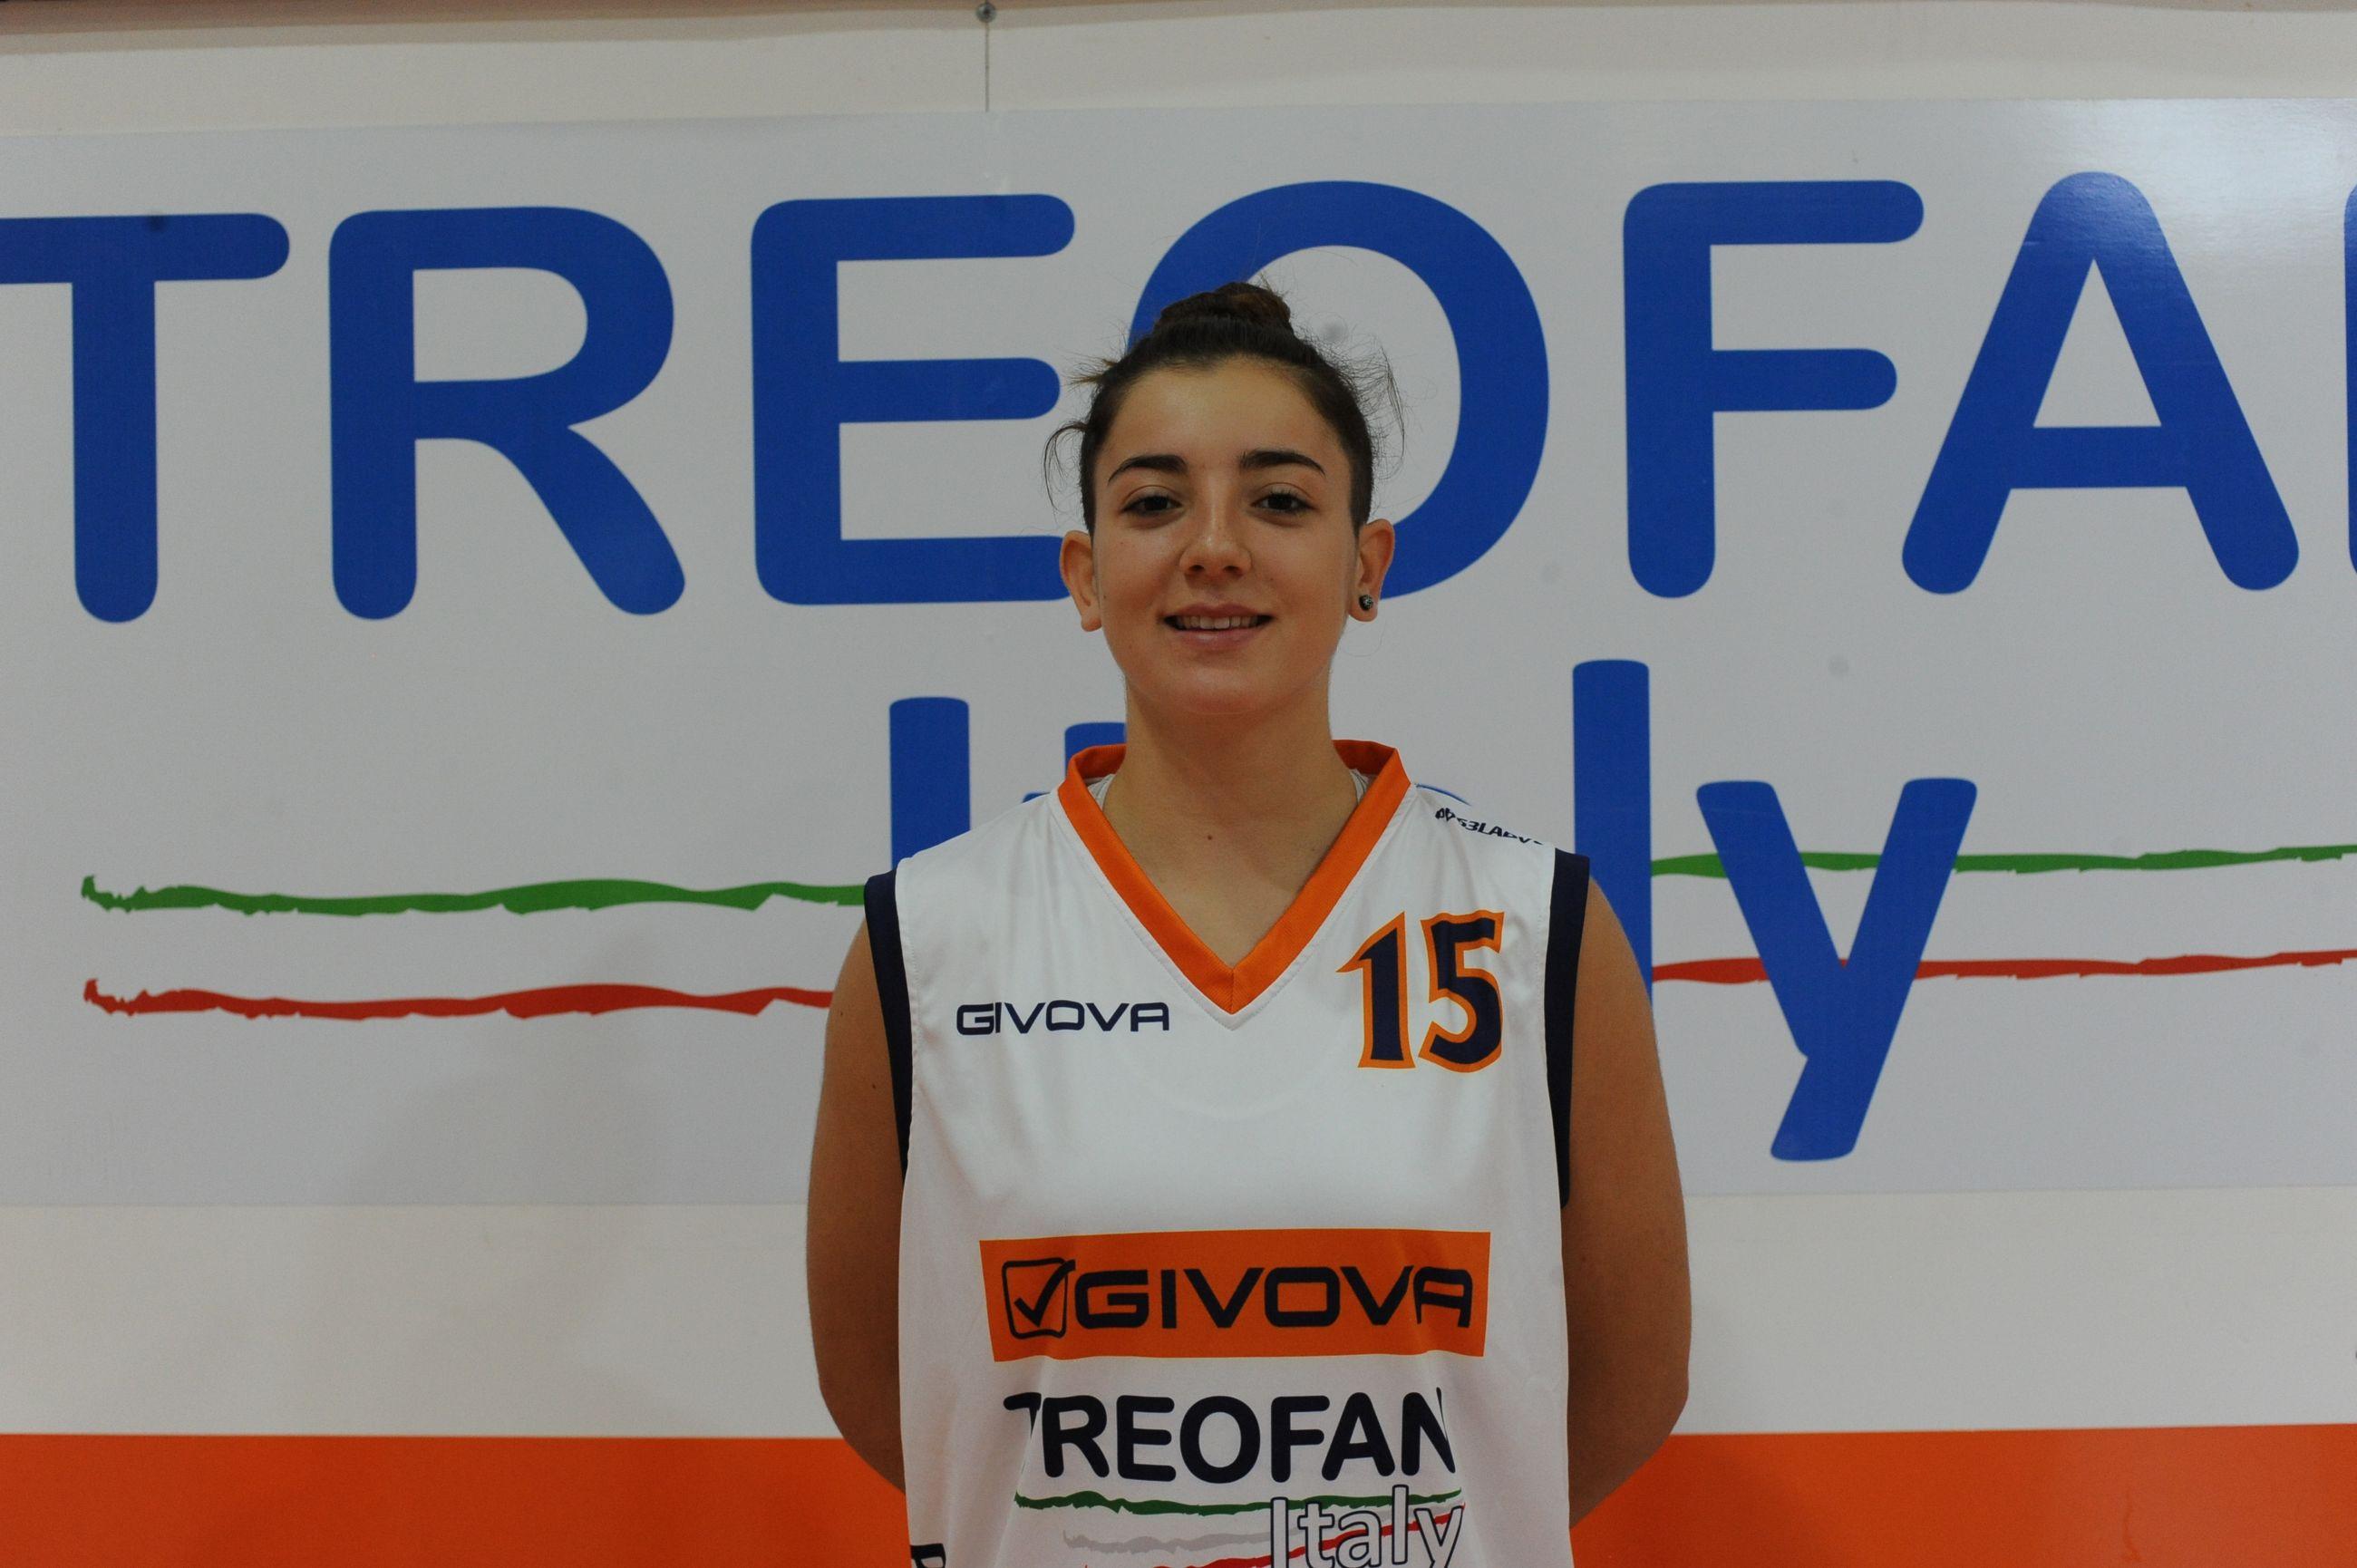 Elena Vella